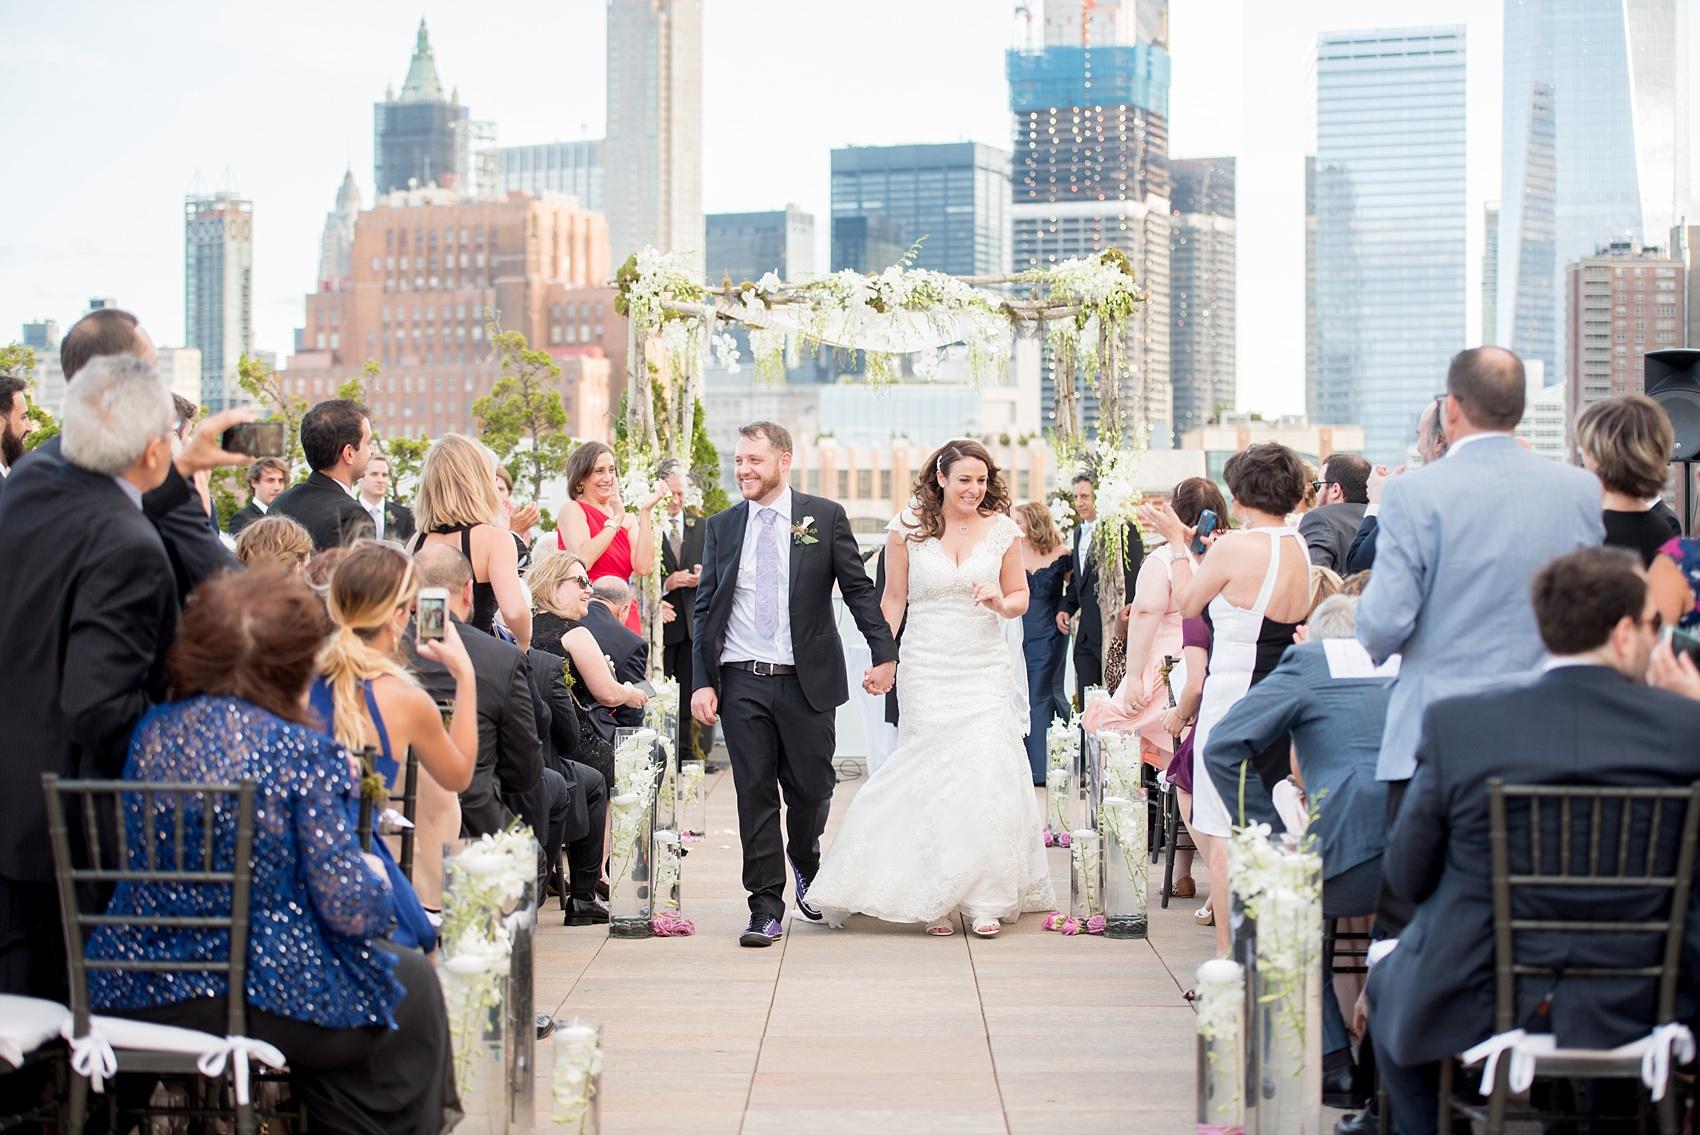 Beautiful Outdoor Wedding Ceremony At Tribeca Rooftop: Tribeca Rooftop Wedding Photos • Bri + Phil